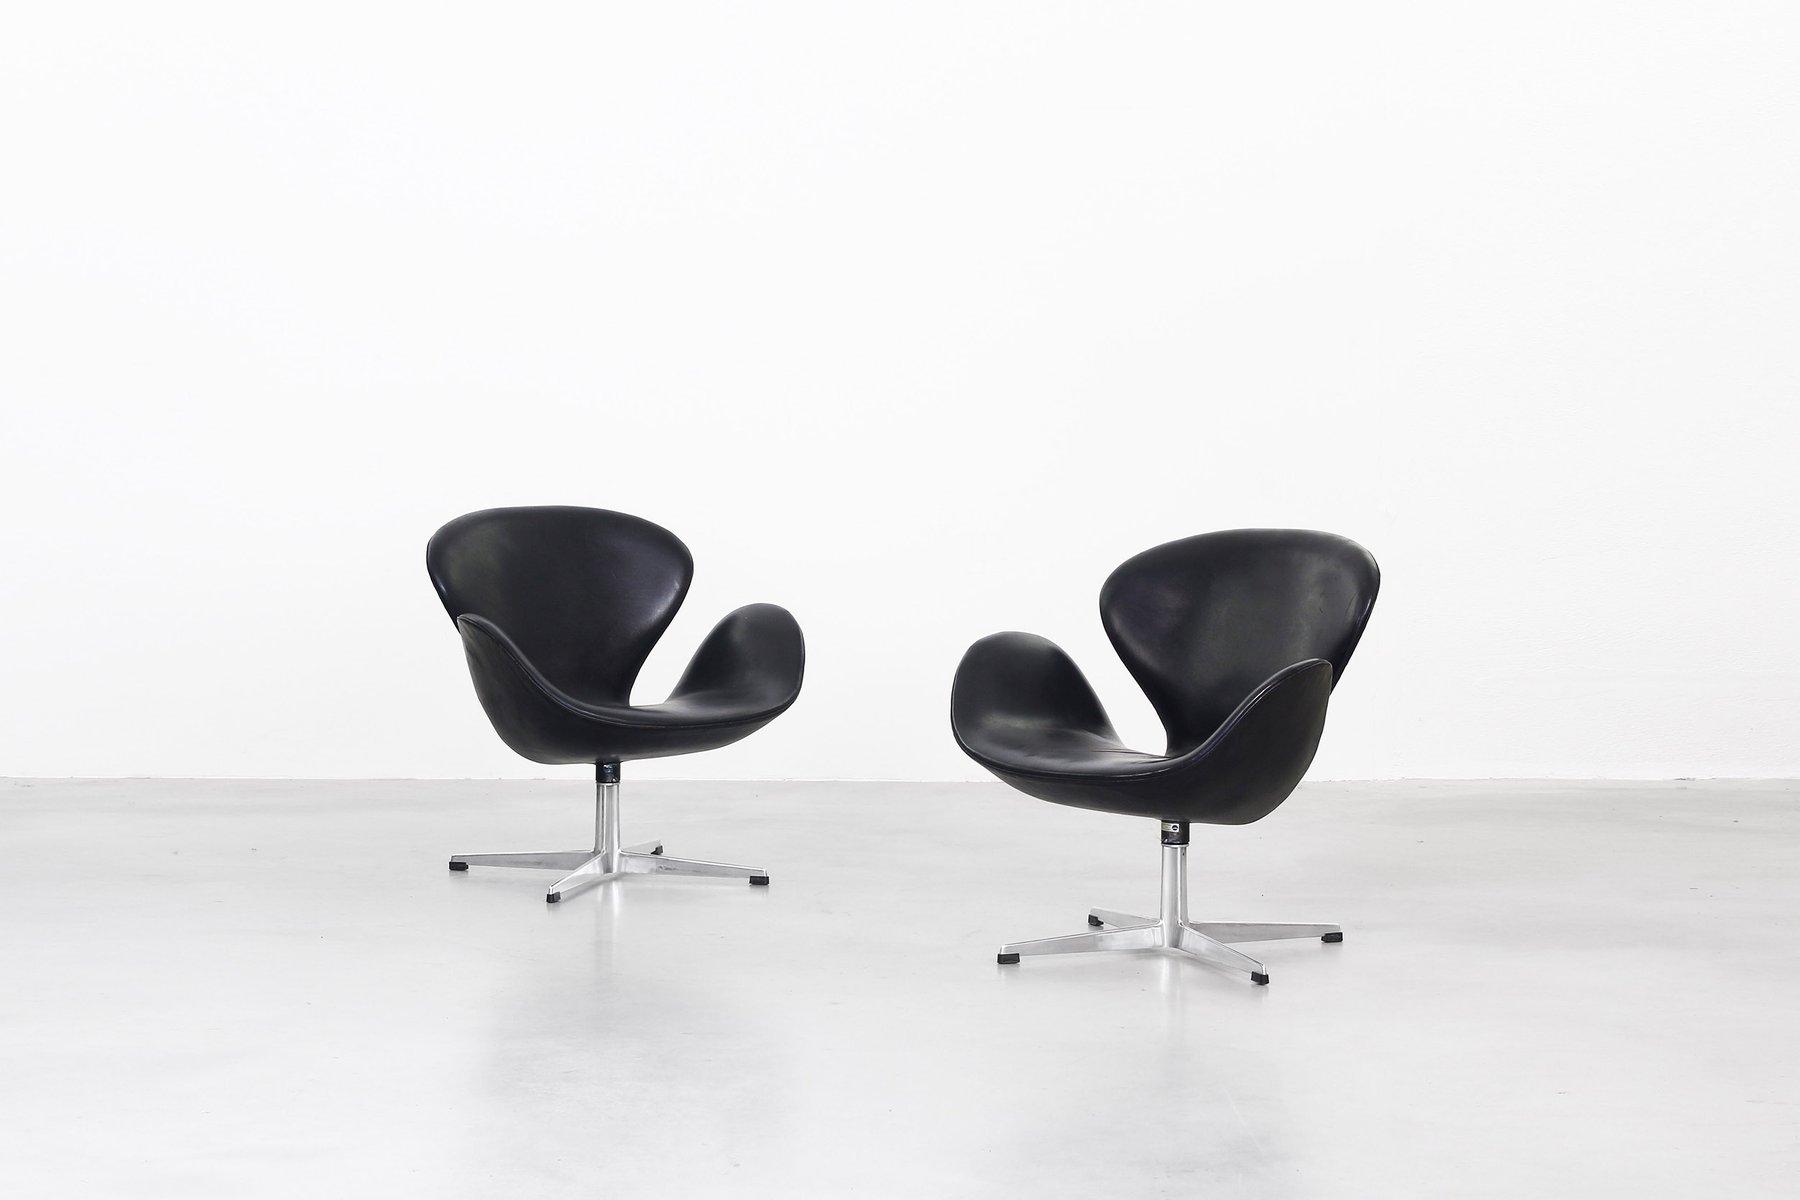 Swan Chairs By Arne Jacobsen For Fritz Hansen, 1963, Set Of 2